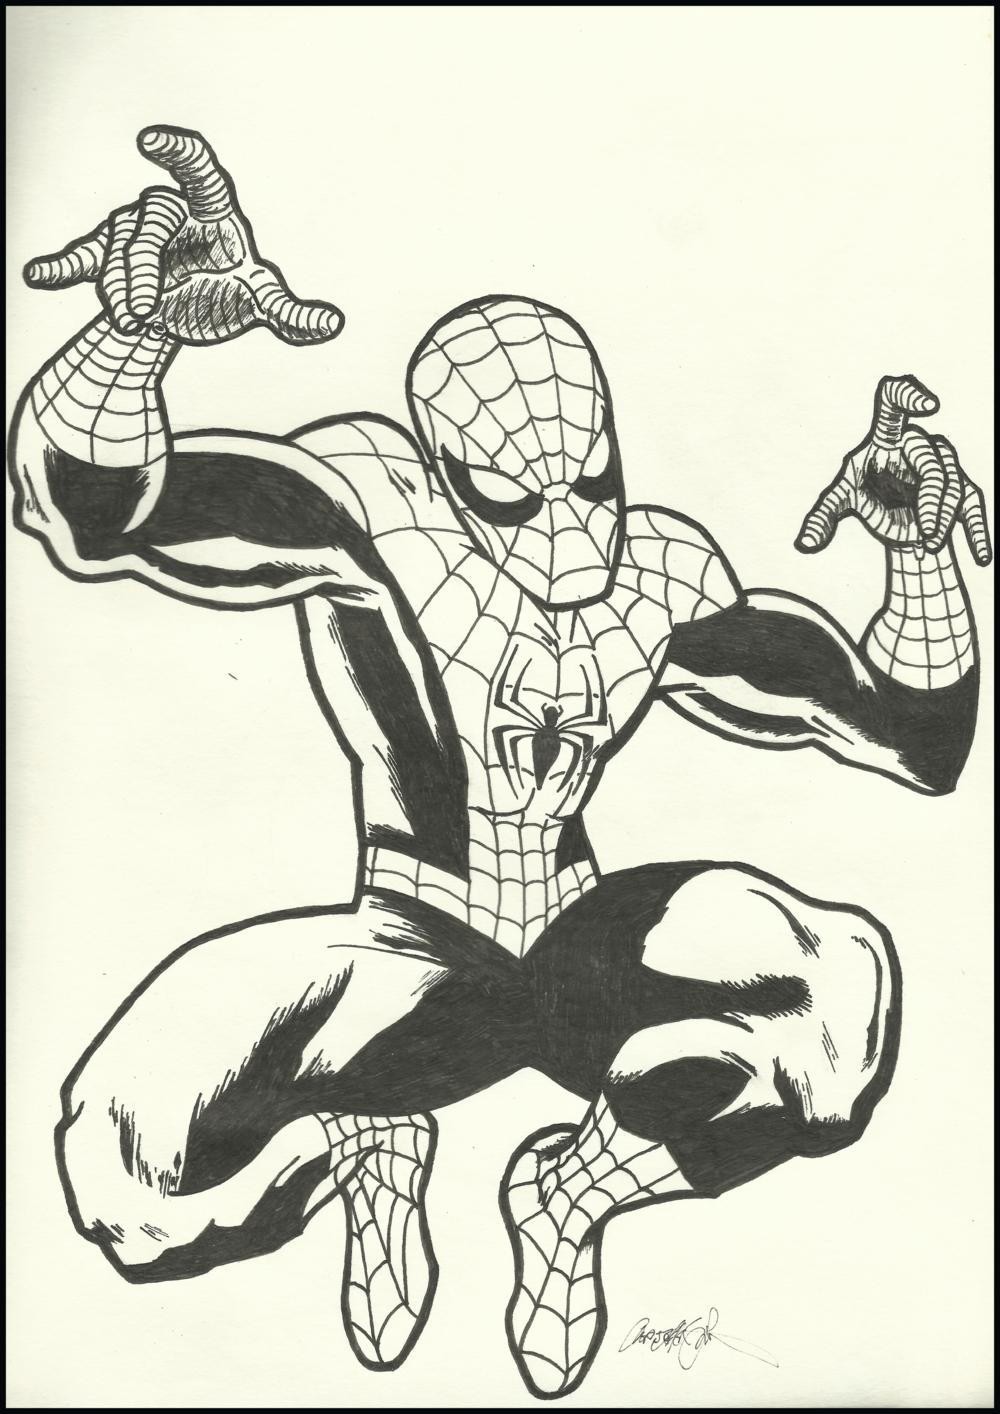 spidey-sketch.png